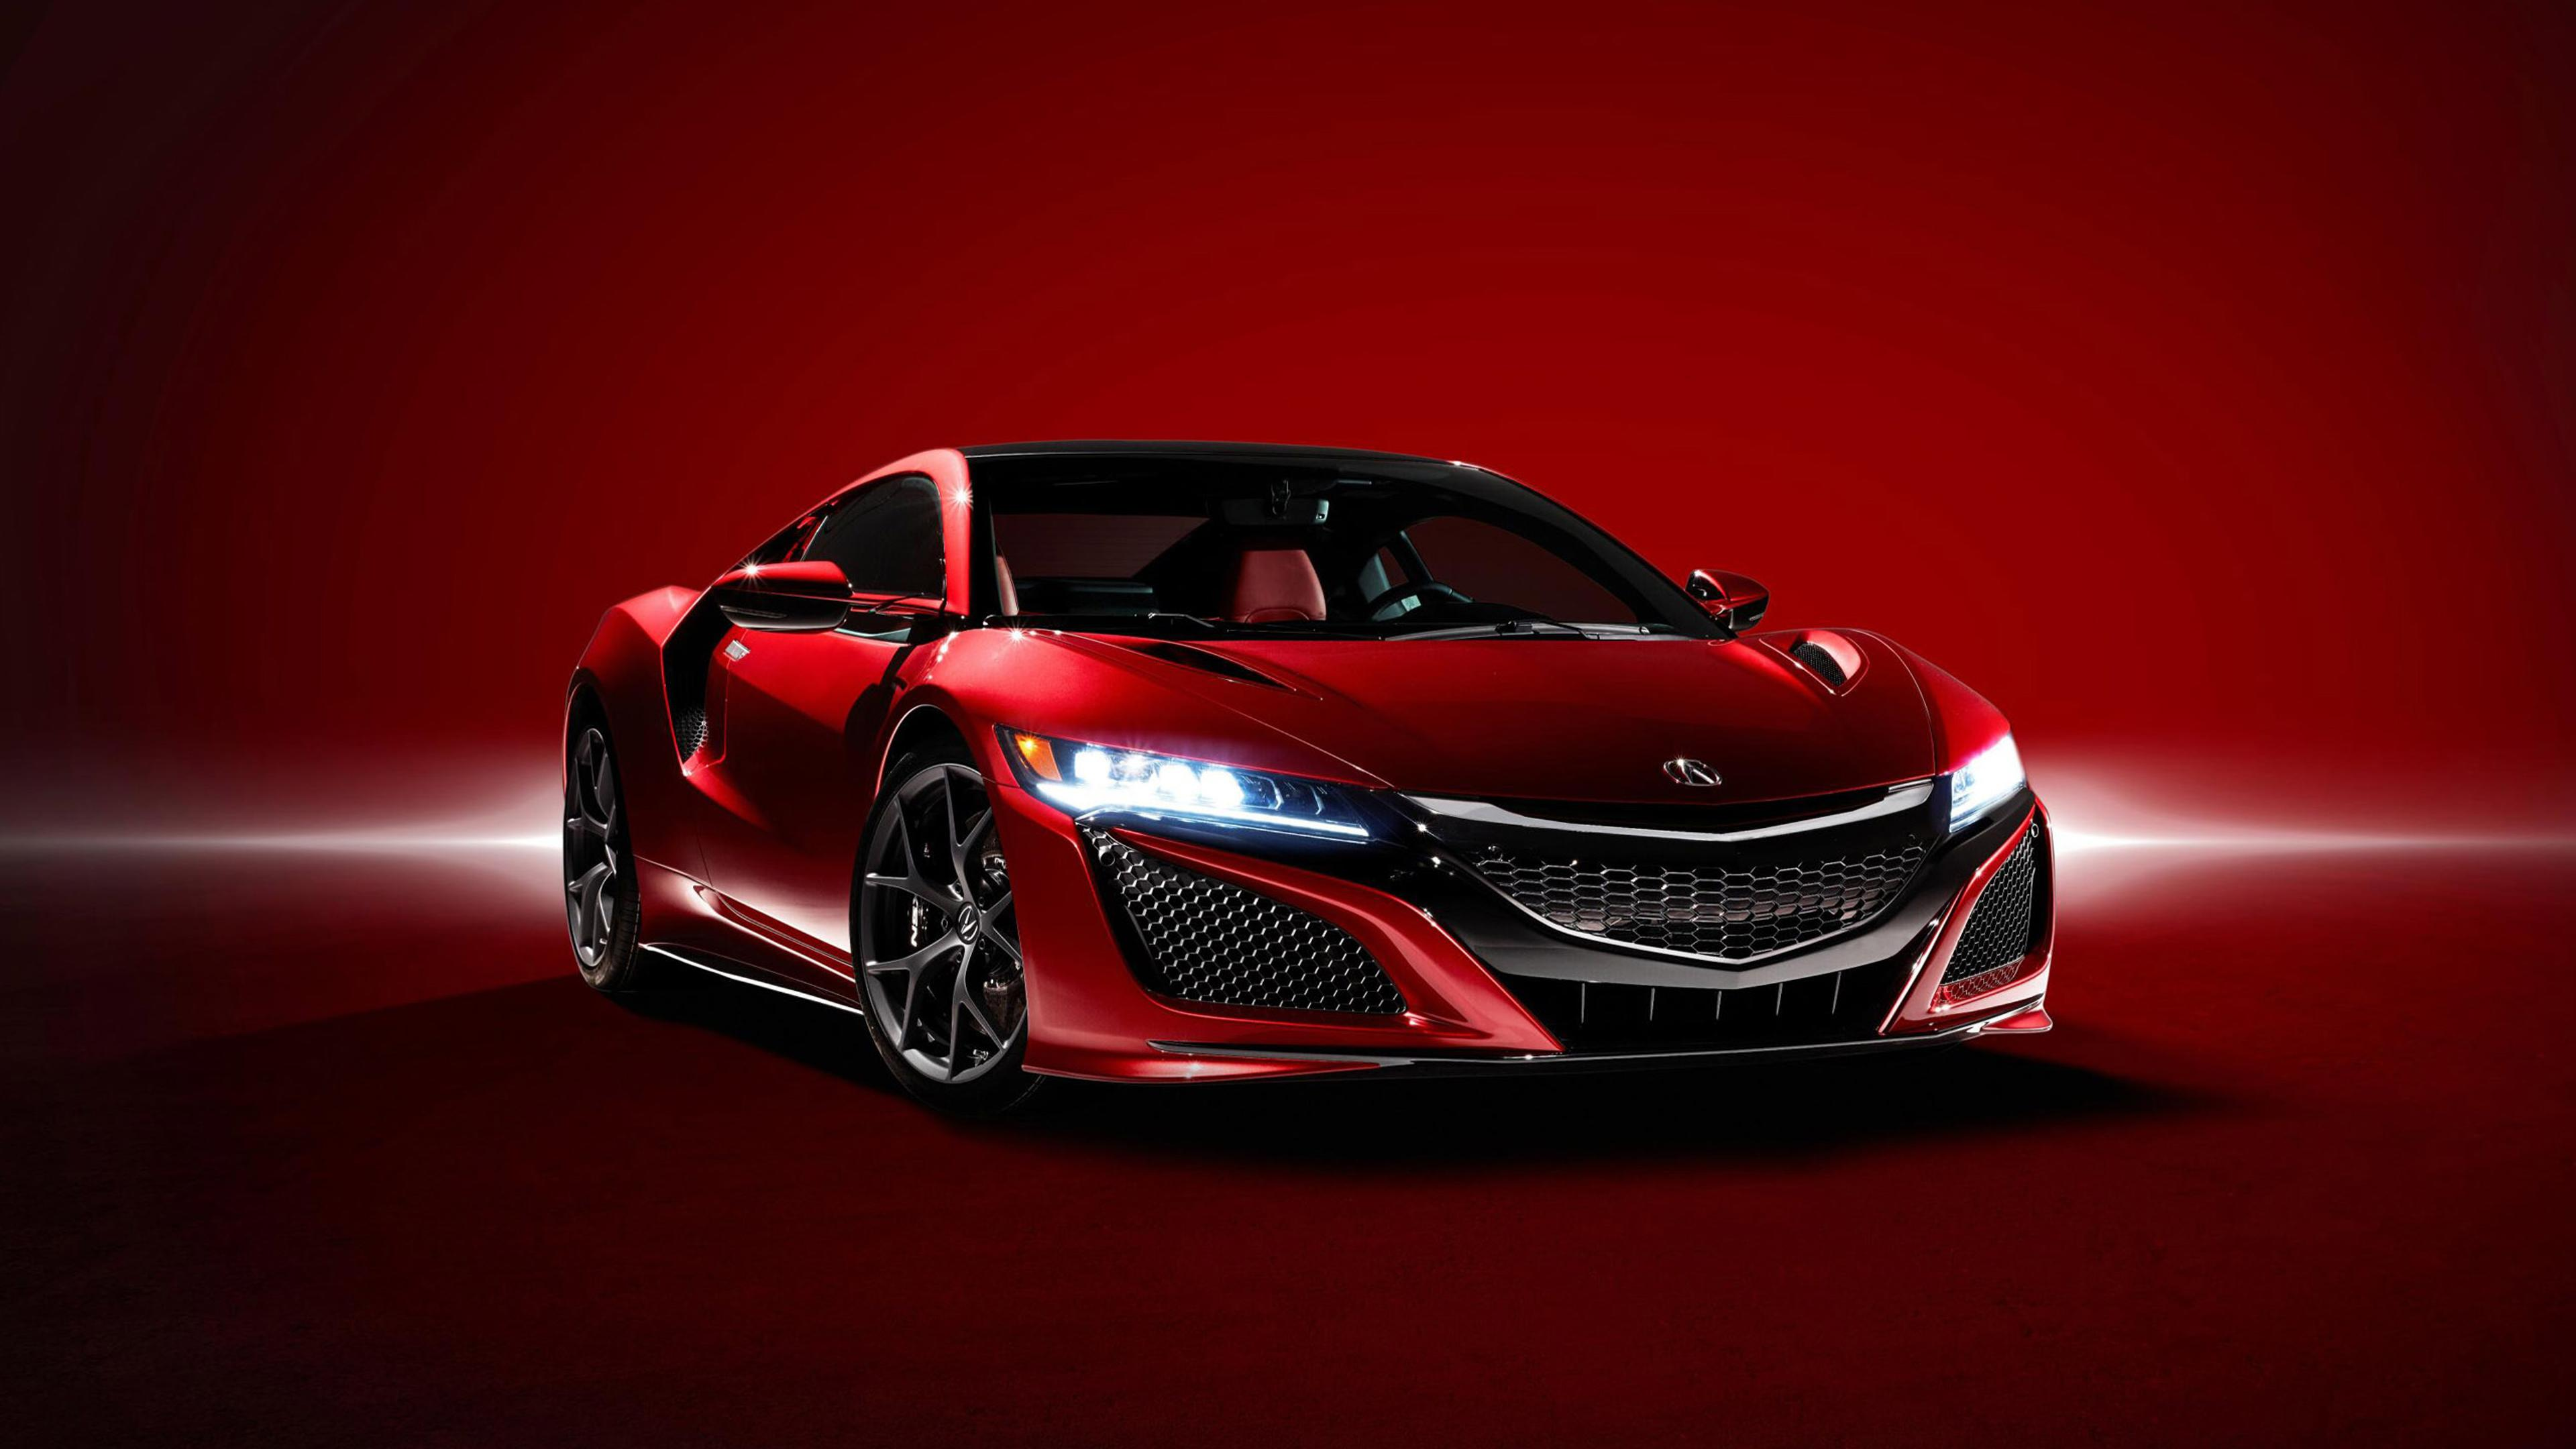 Acura Sports Nsx New Car Update 2020